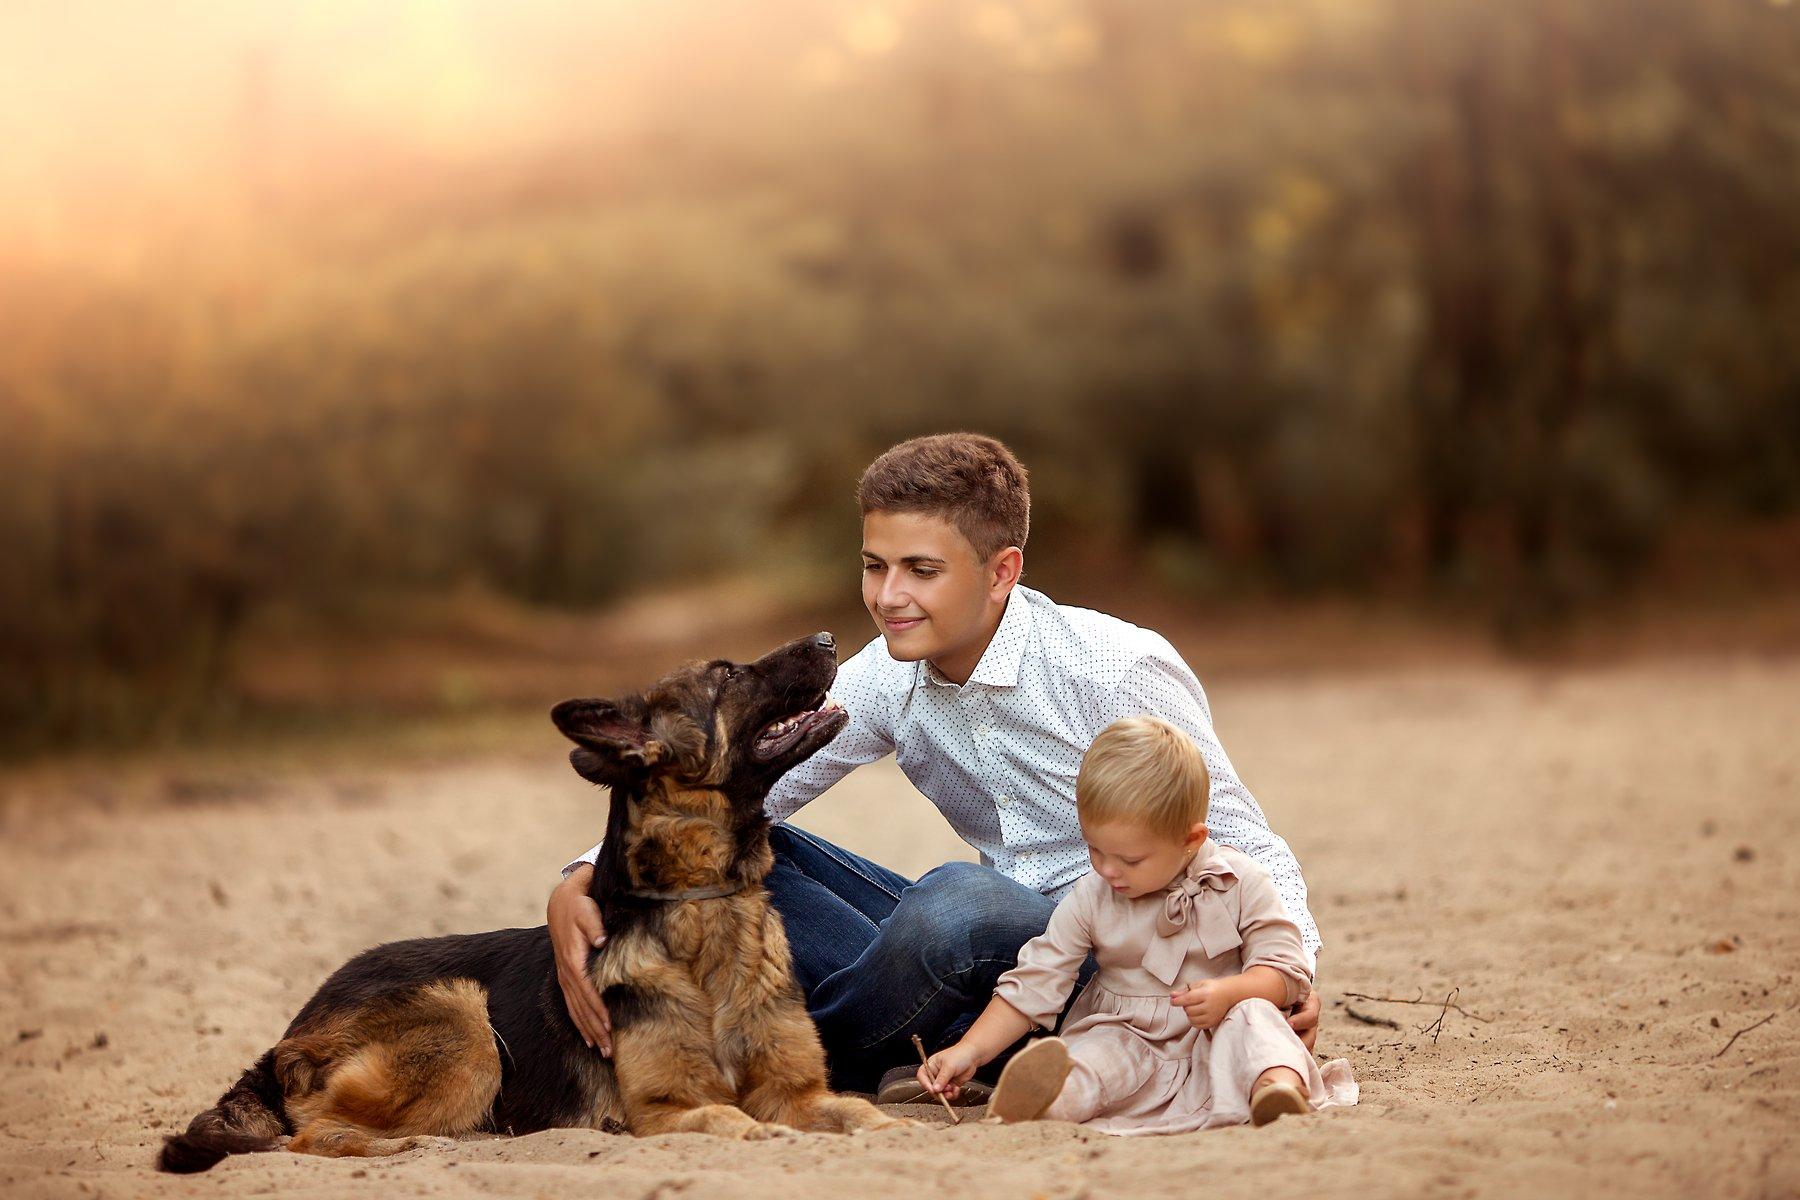 Брат, семья, дети, собака, дружба, лето, Khrapova Yulia